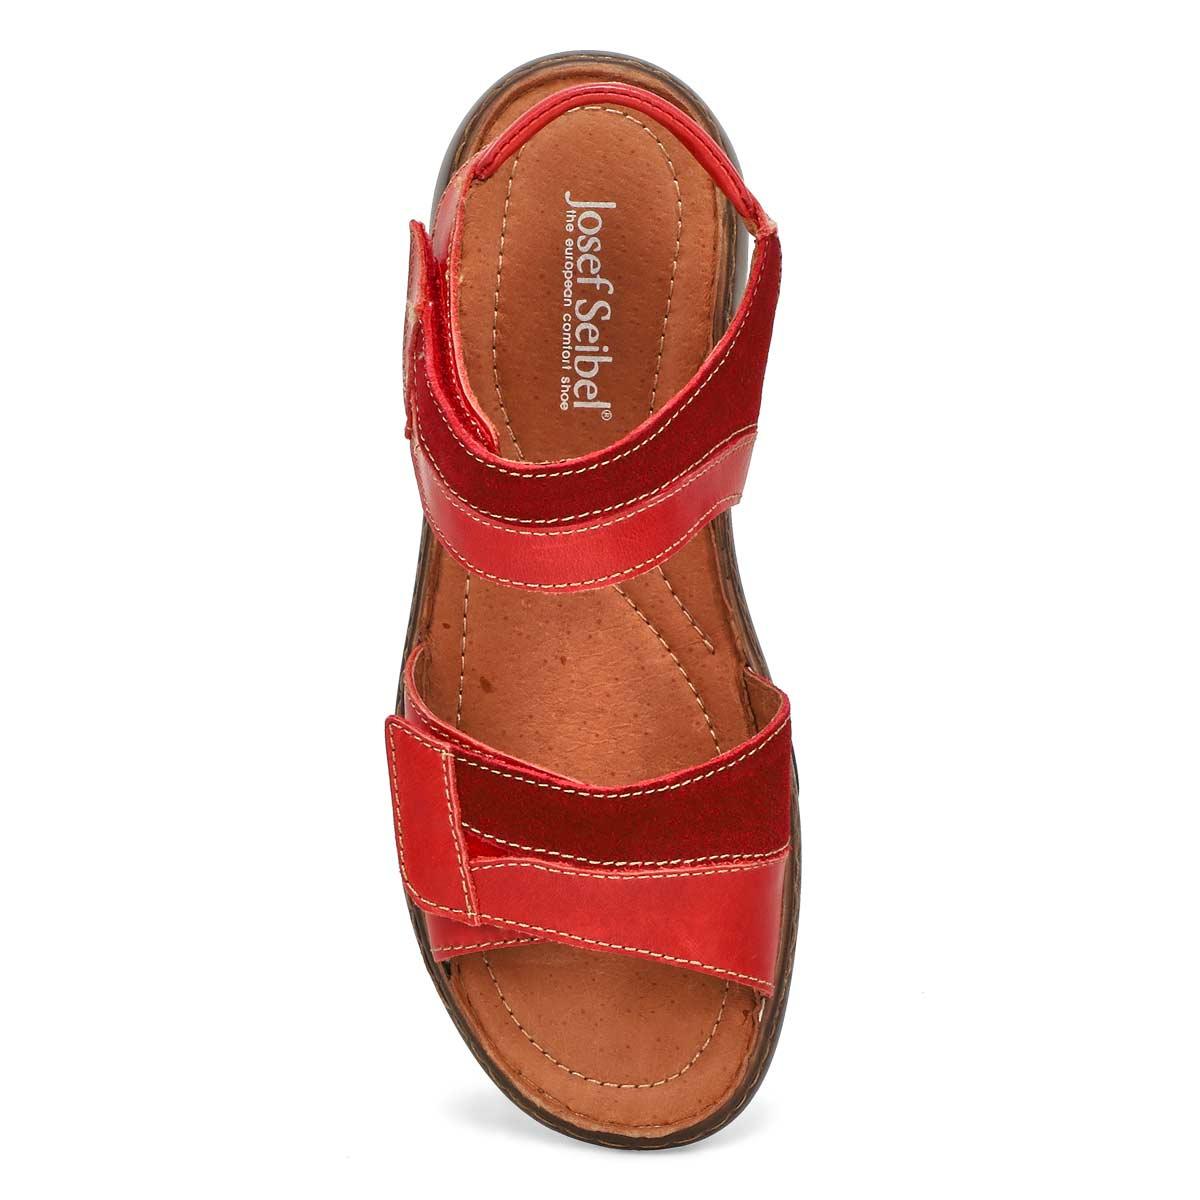 Lds Debra 19 red casual 2 strap sandal